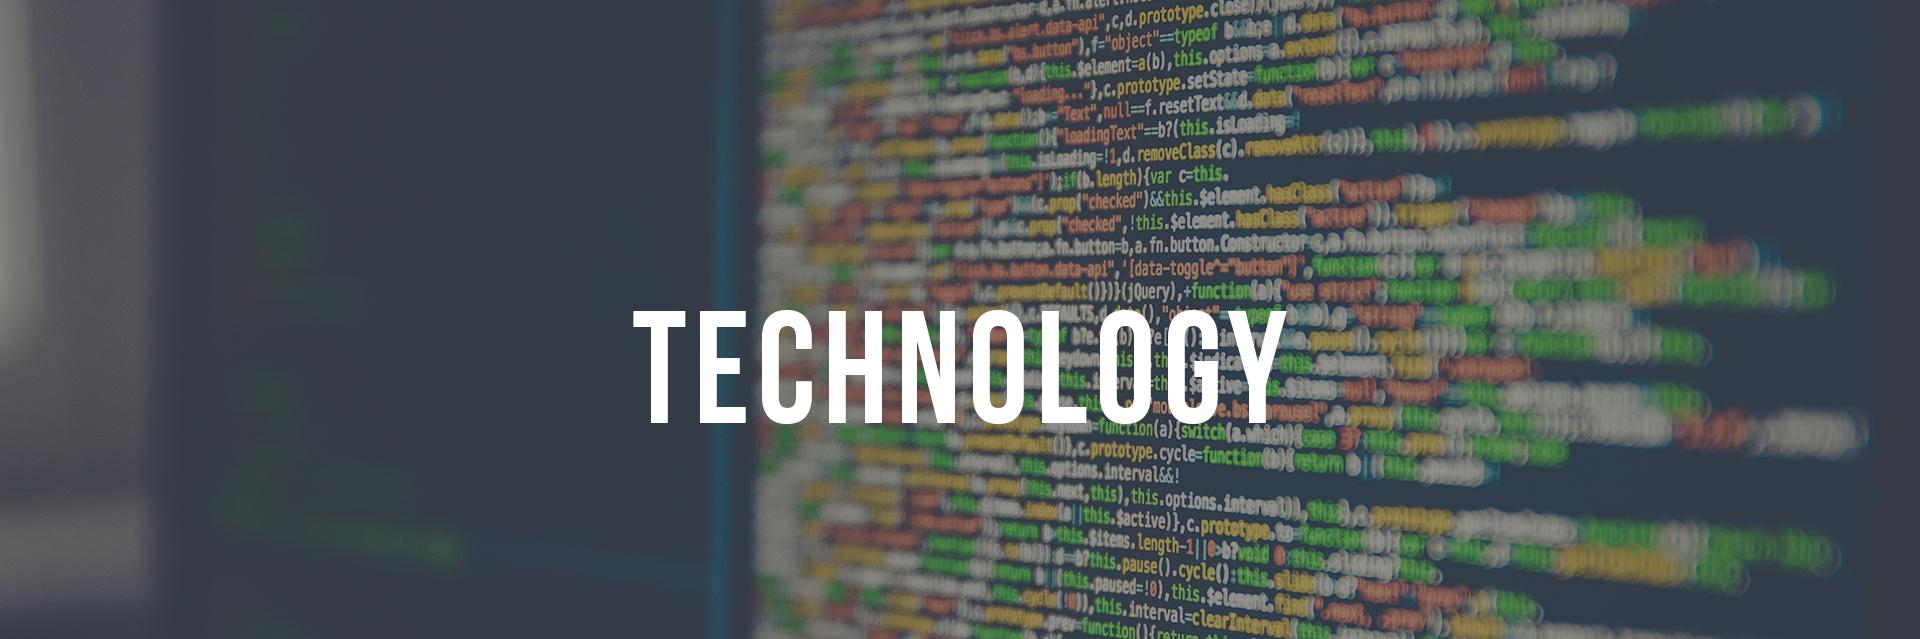 Technology-1